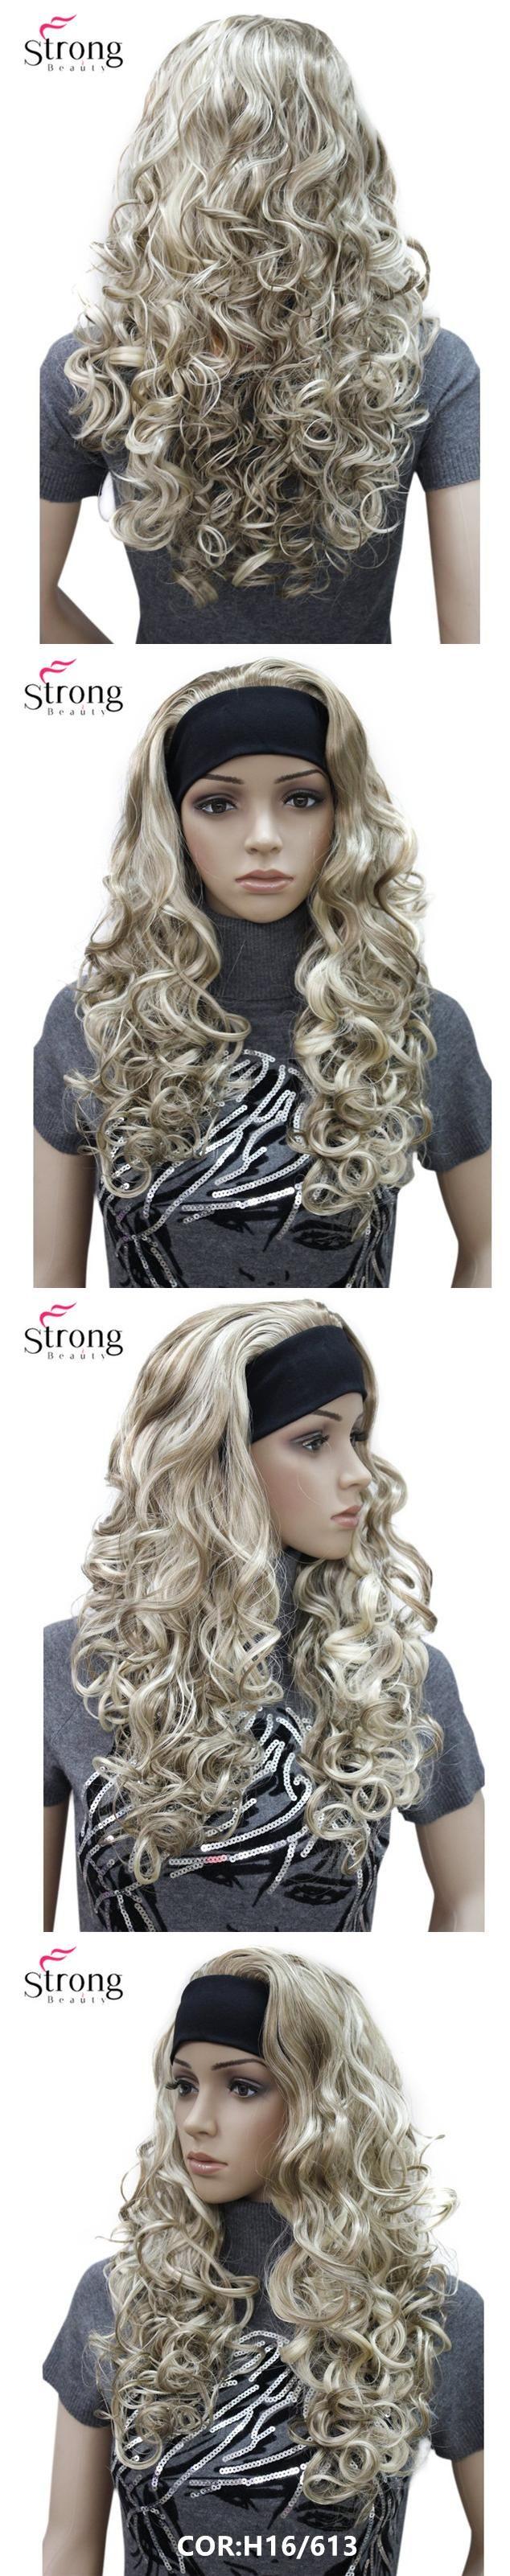 best 25+ black headband ideas on pinterest   black makeup headband